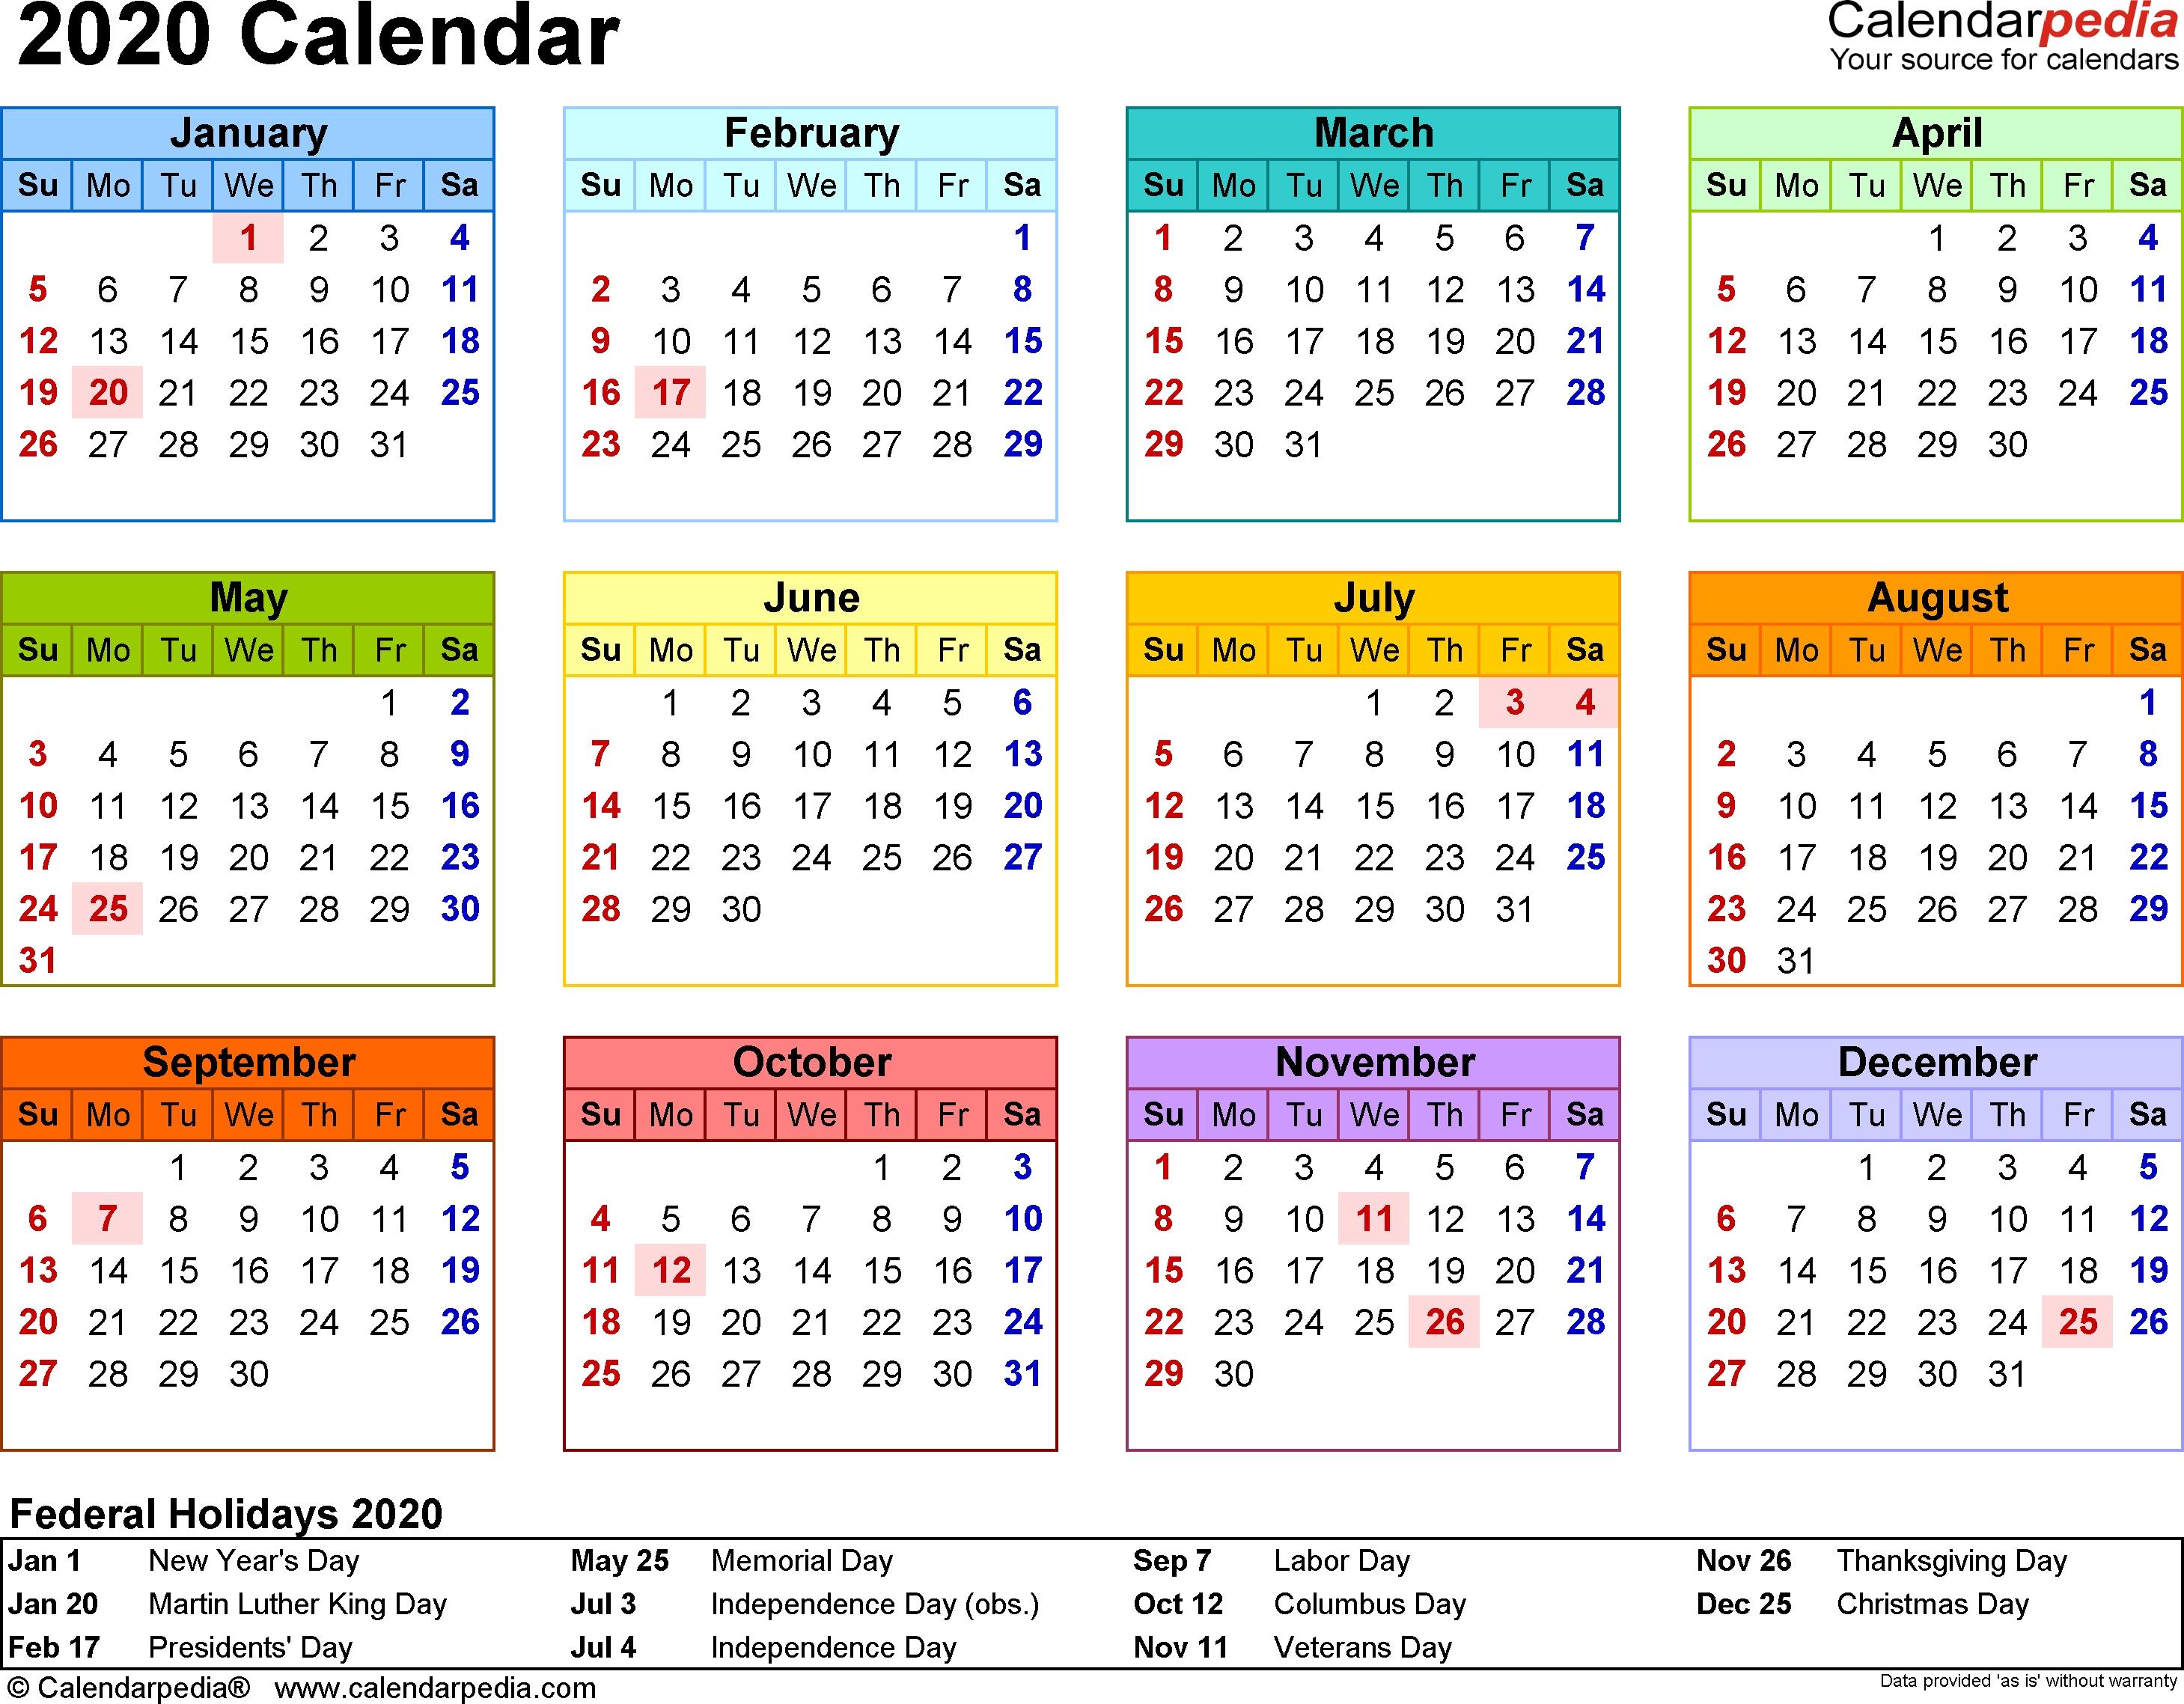 2020 Calendar - Download 18 Free Printable Excel Templates-6 Month Blank Calendar 2020